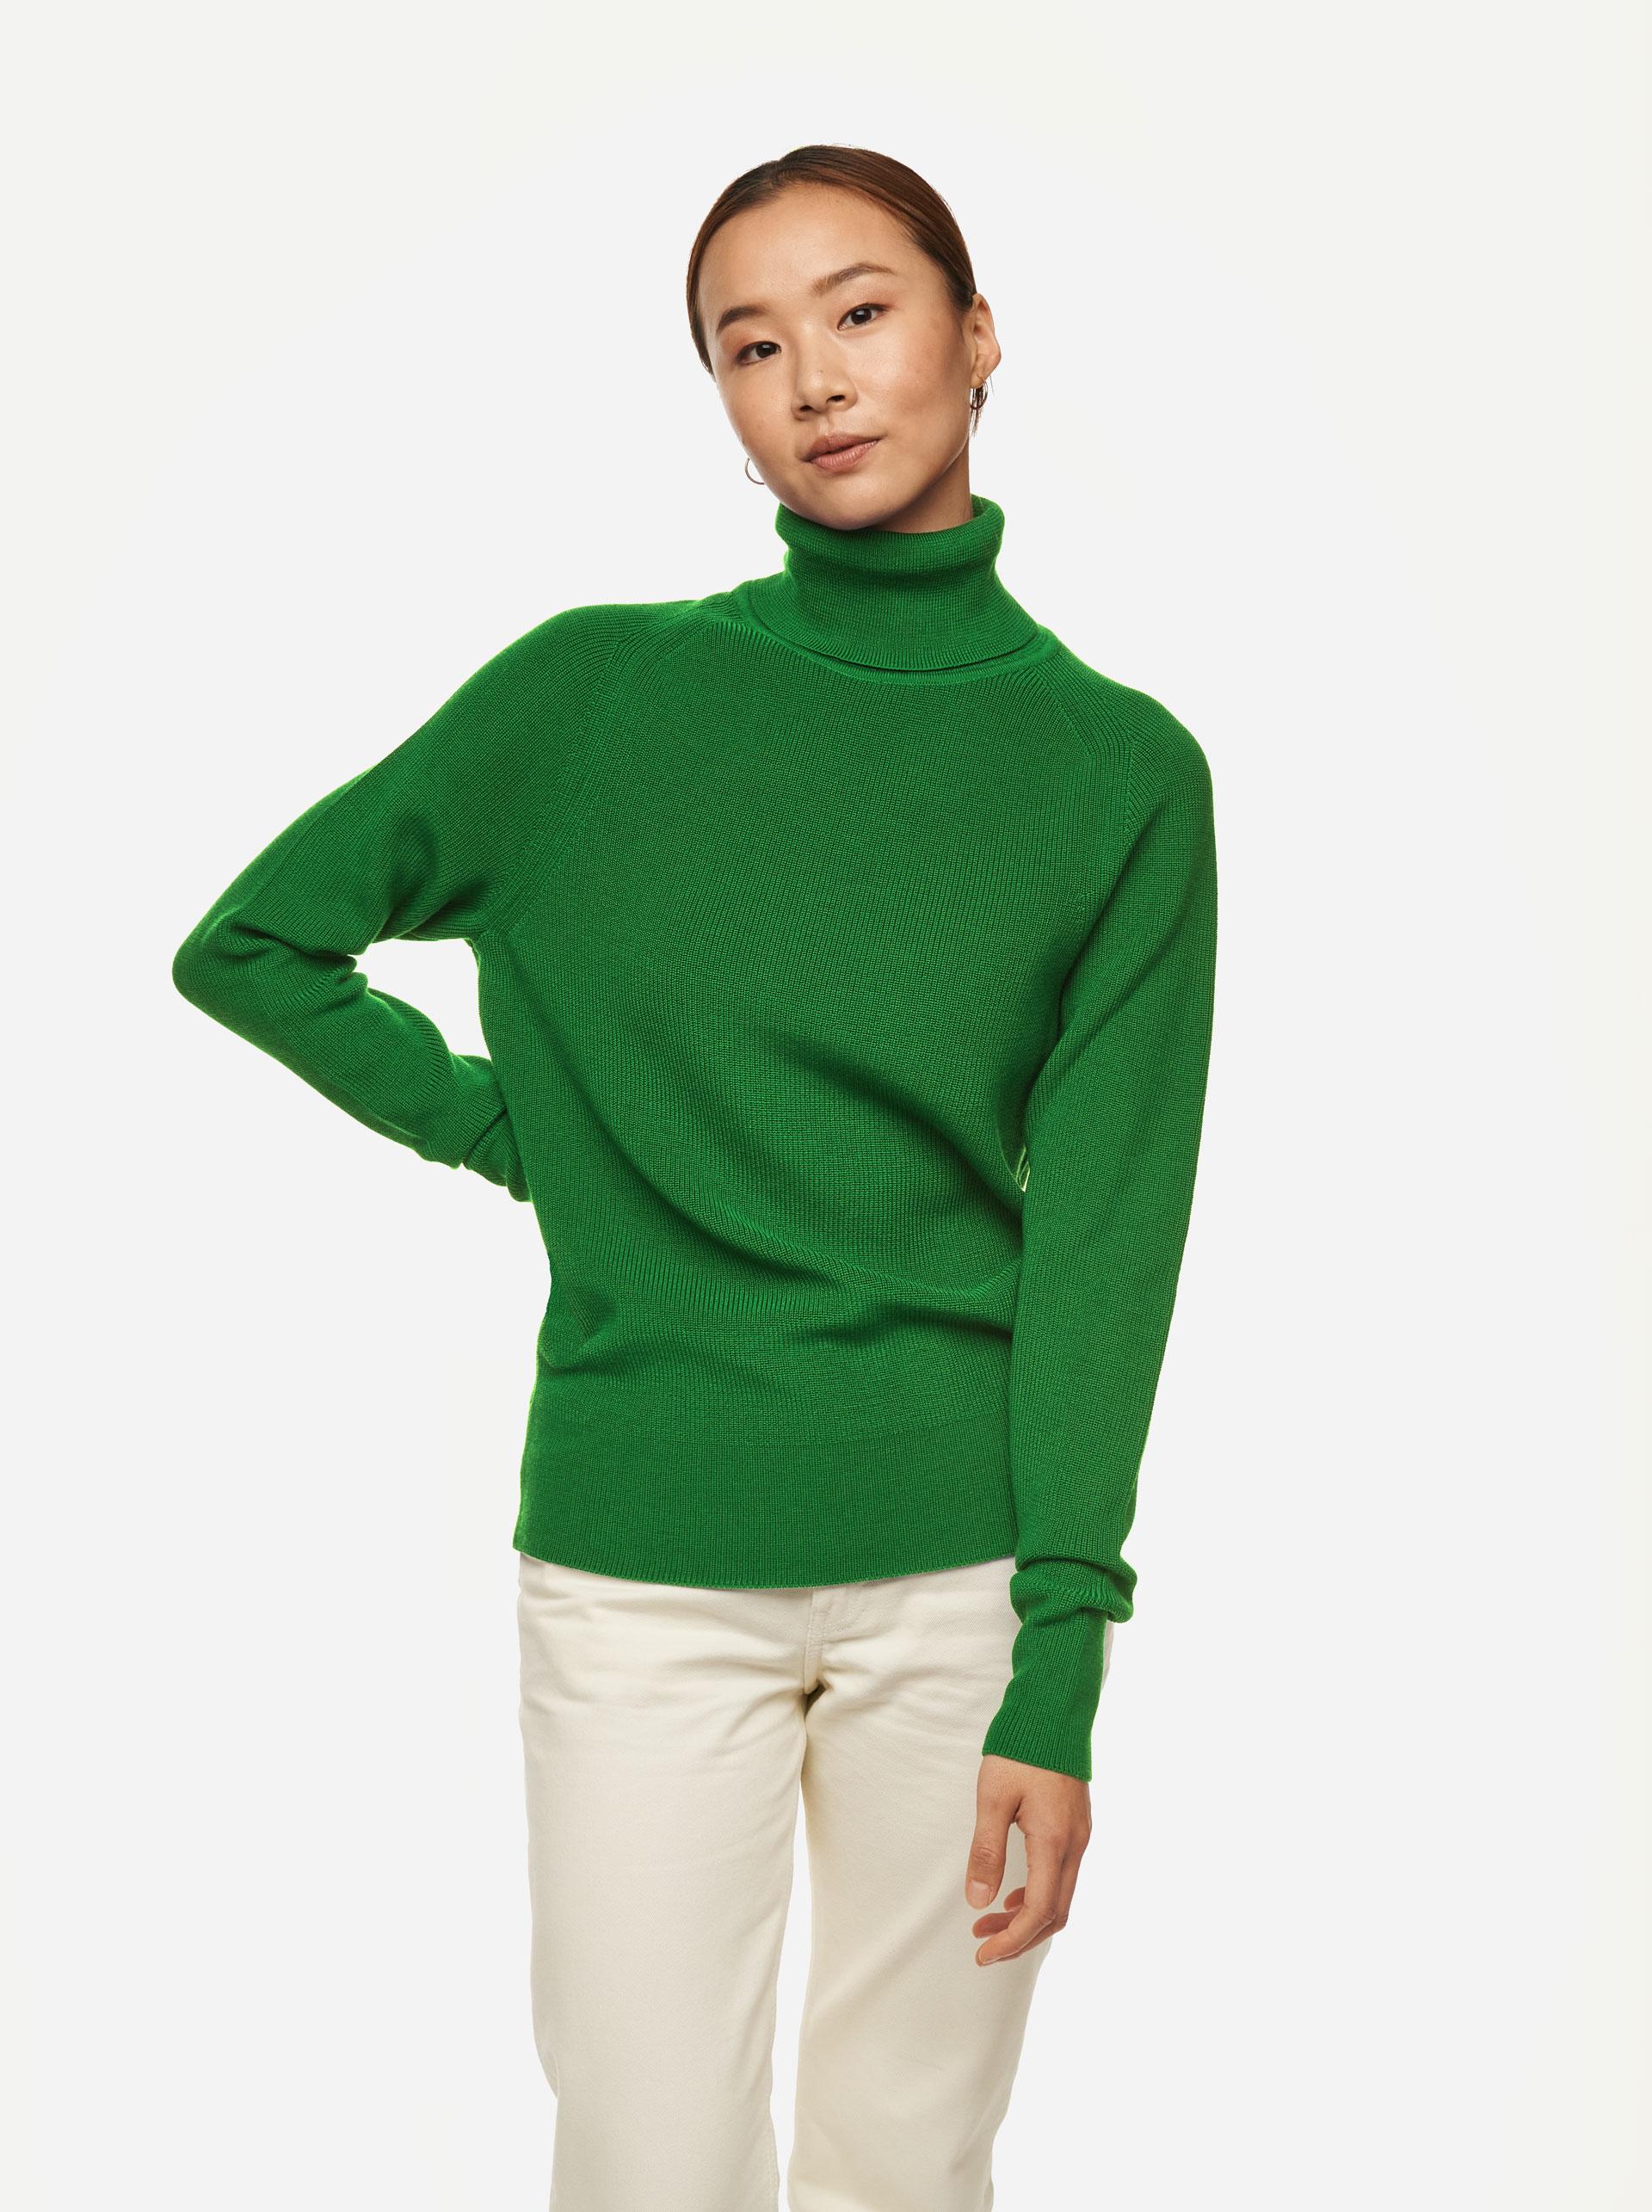 Teym - Turtleneck - The Merino Sweater - Men - Bright Green - 1